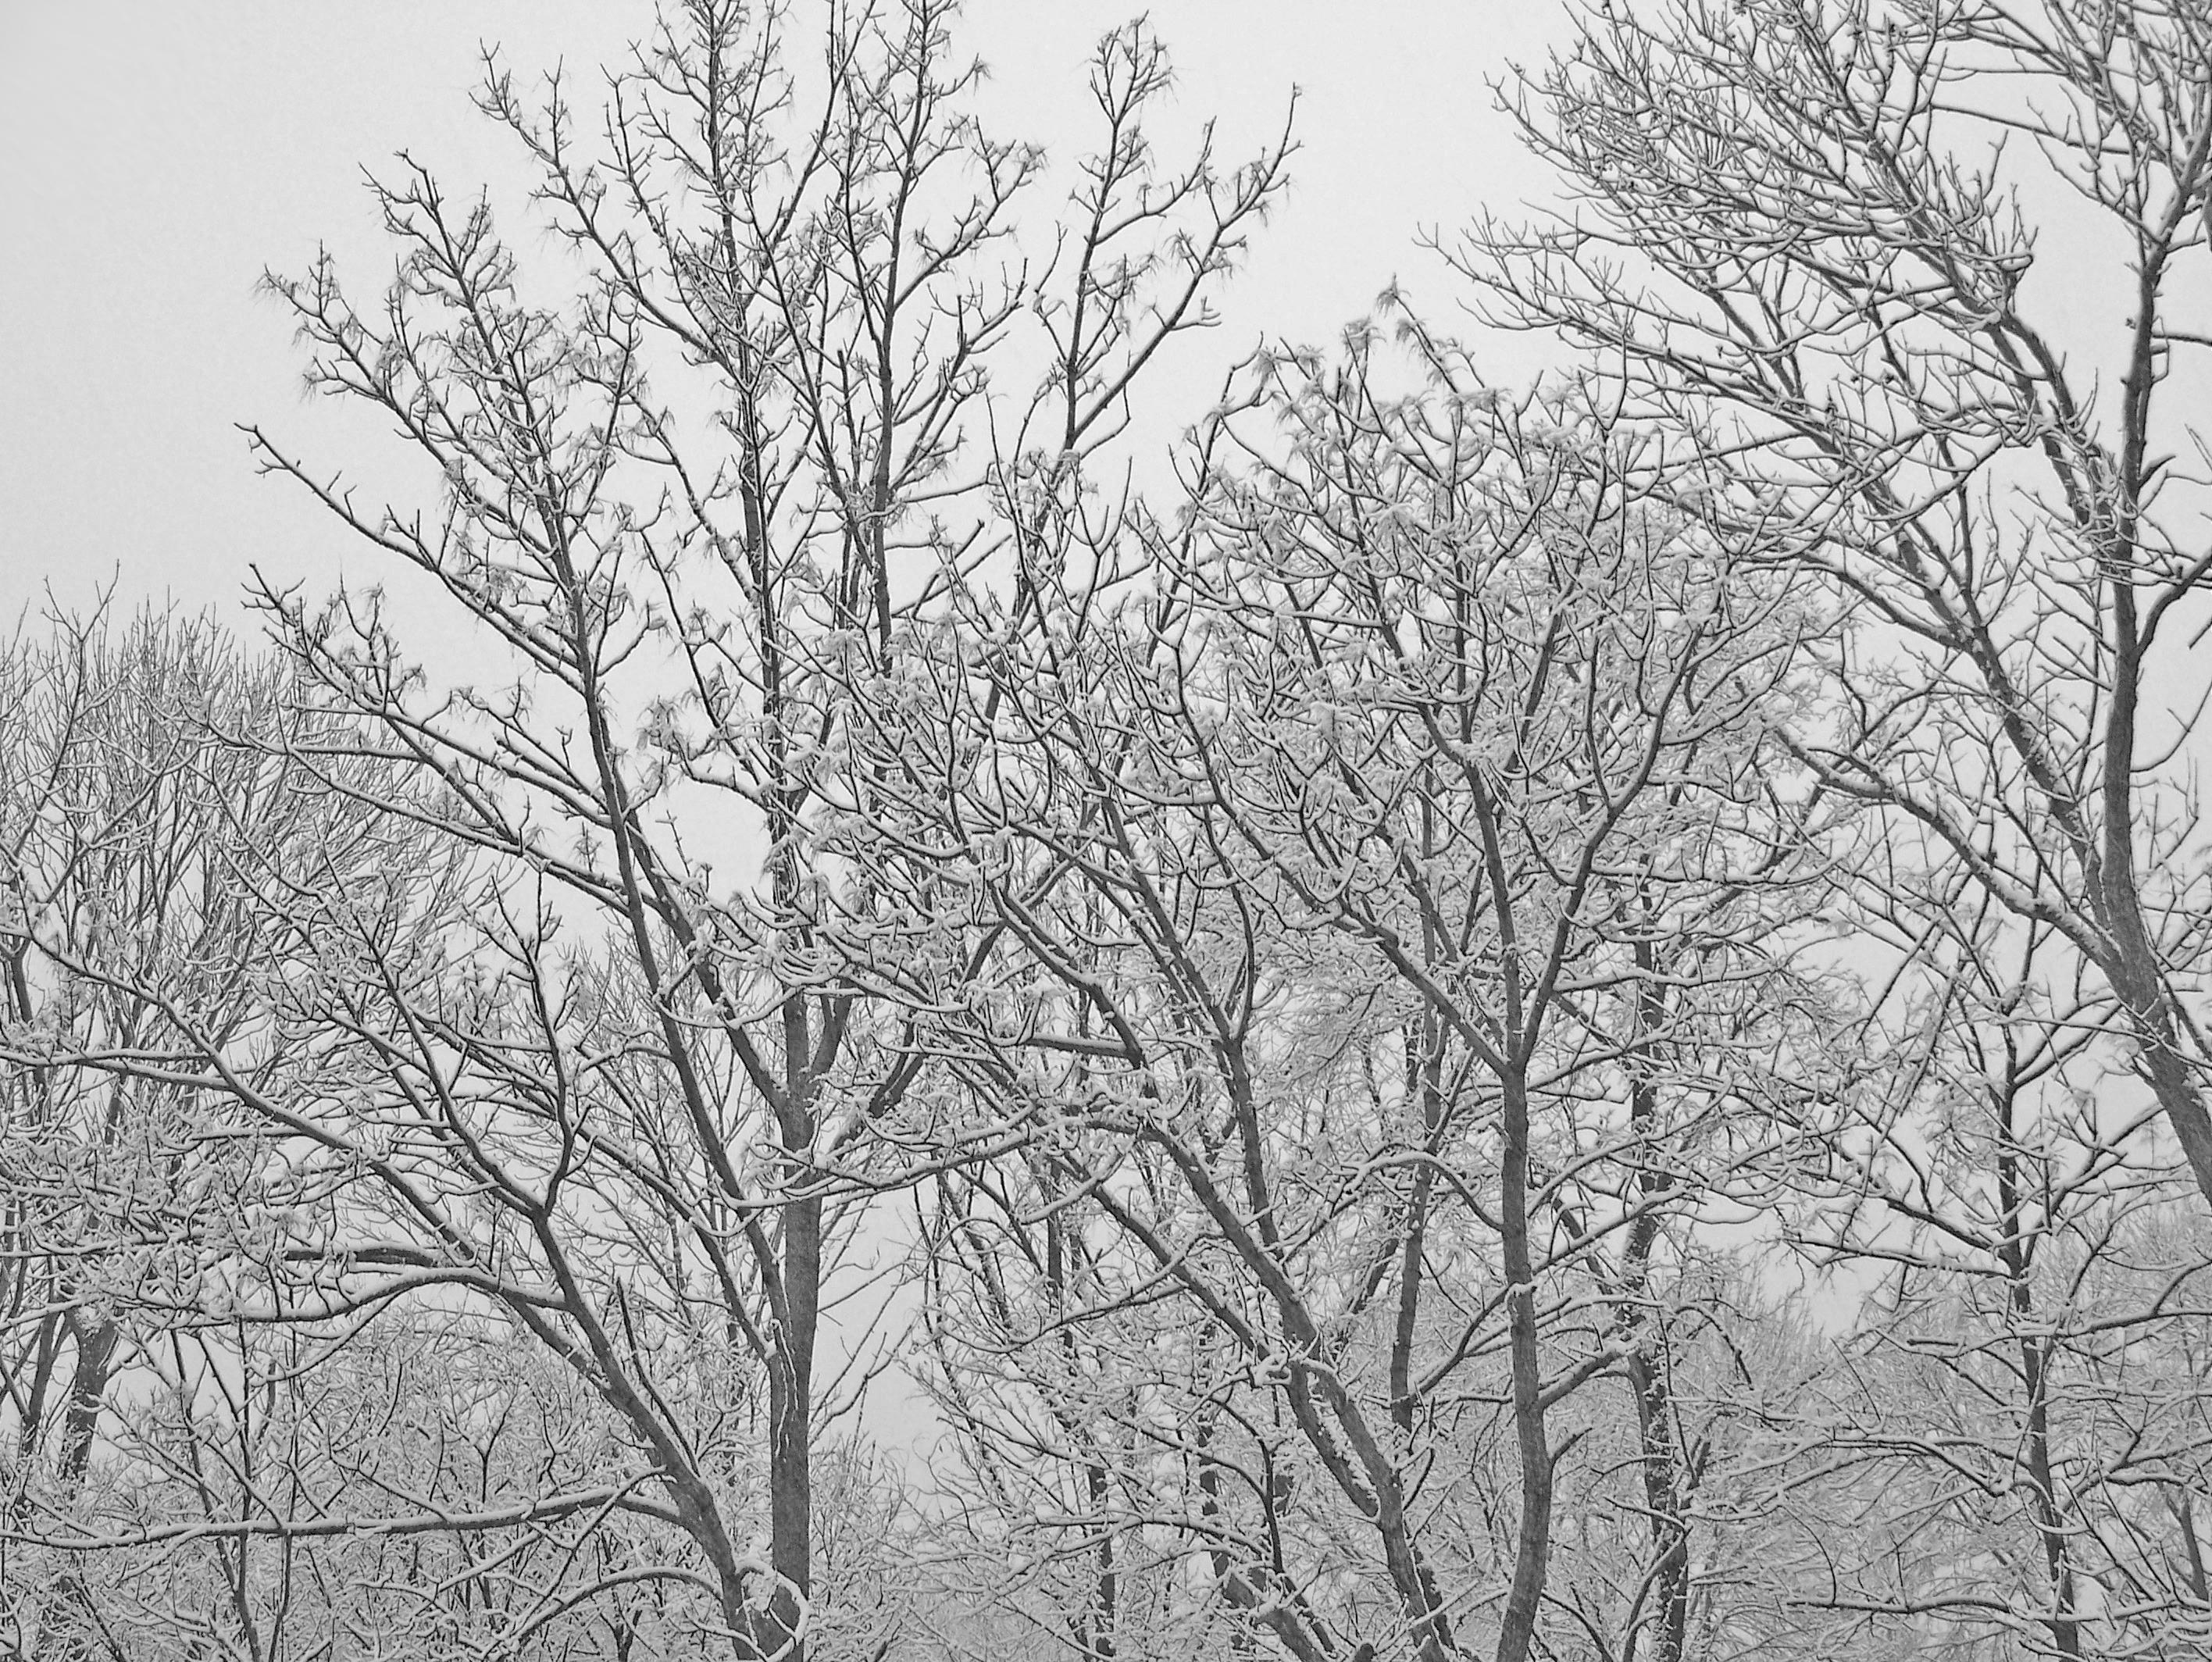 Gambar Pemandangan Hutan Outdoor Cabang Musim Dingin Hitam